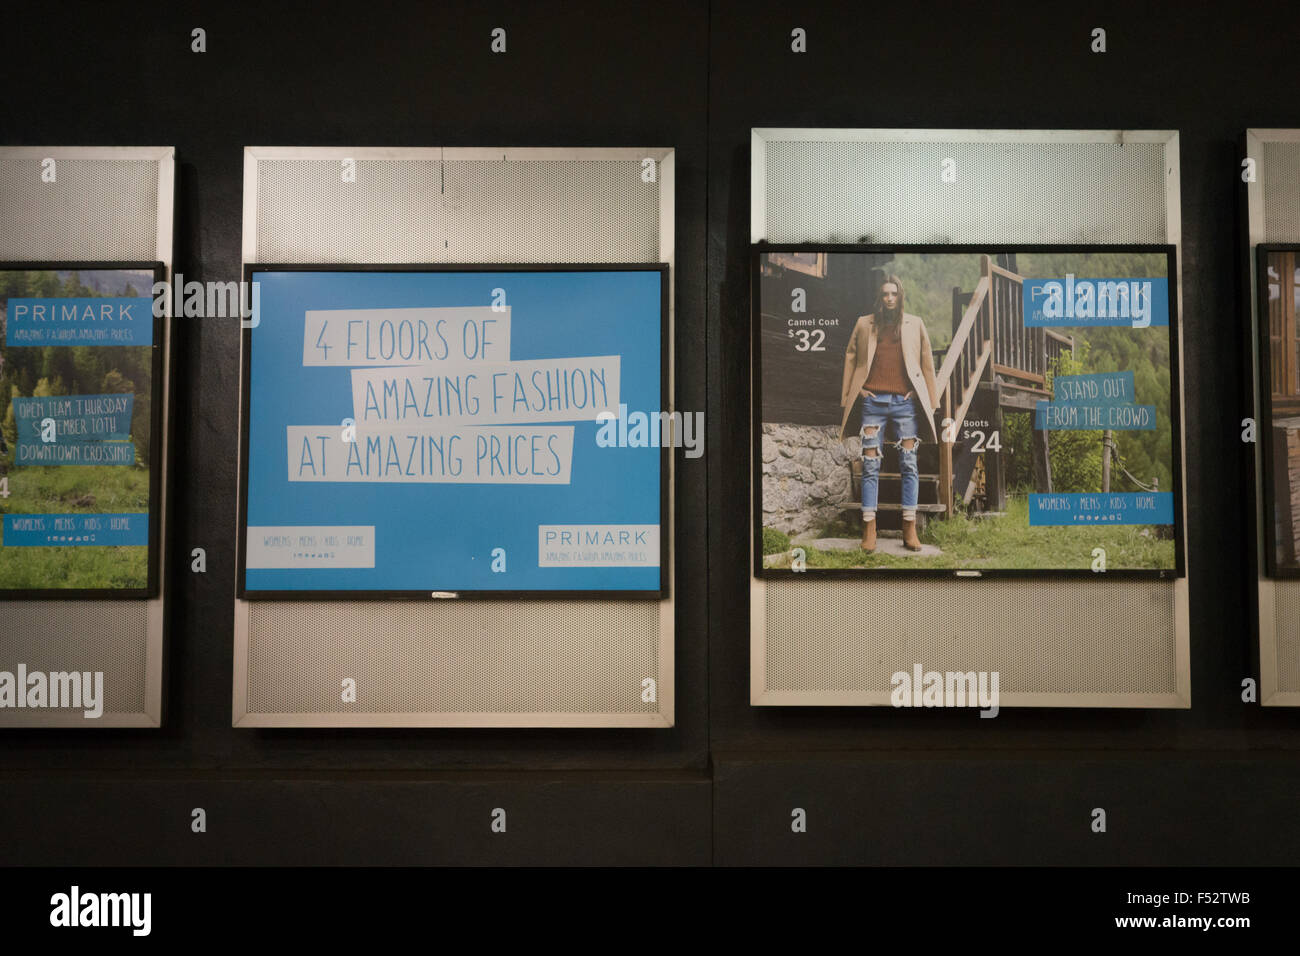 primark ads boston station - Stock Image